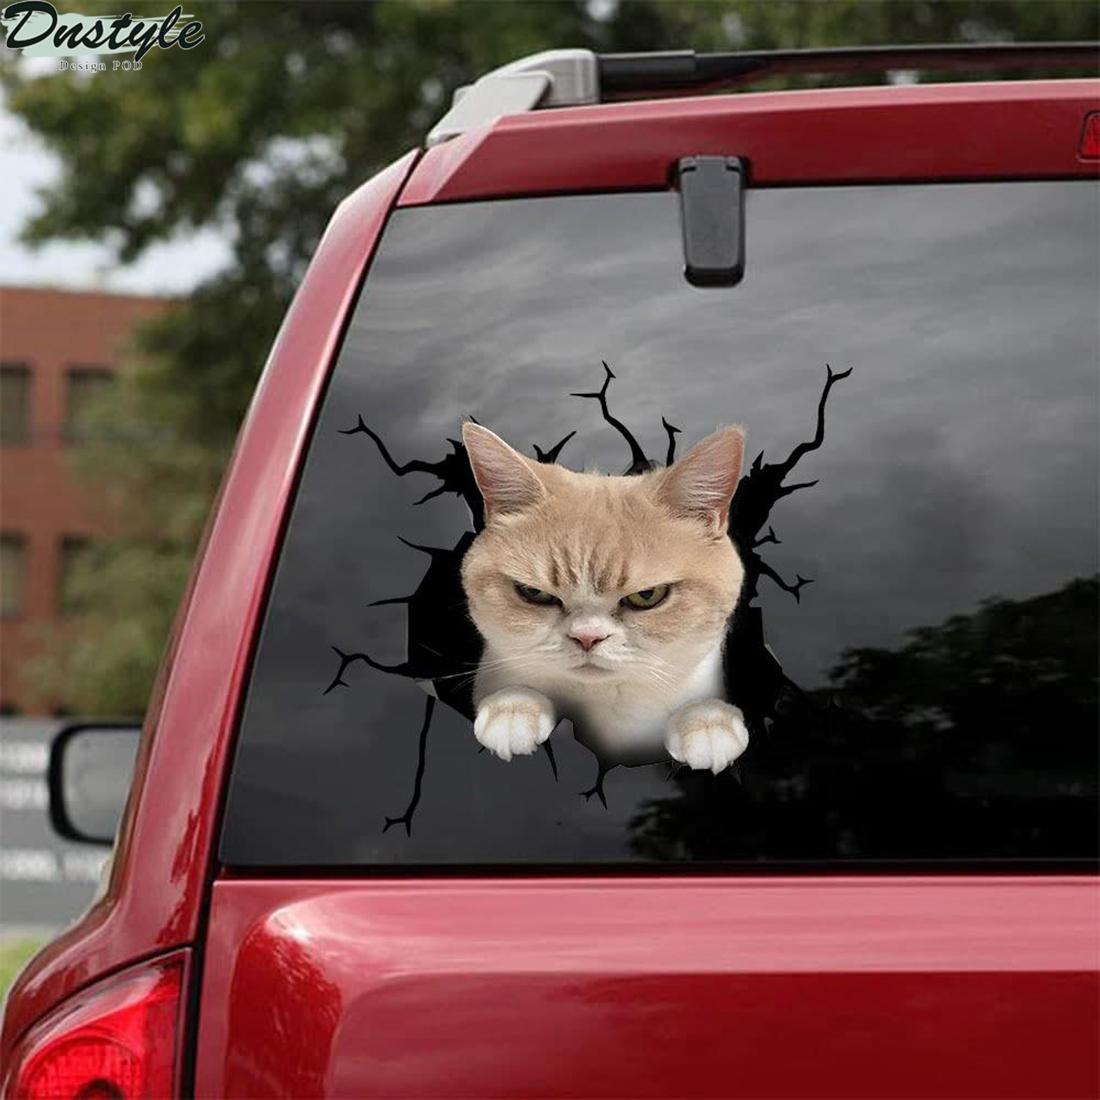 Grumpy cat car decal sticker 1